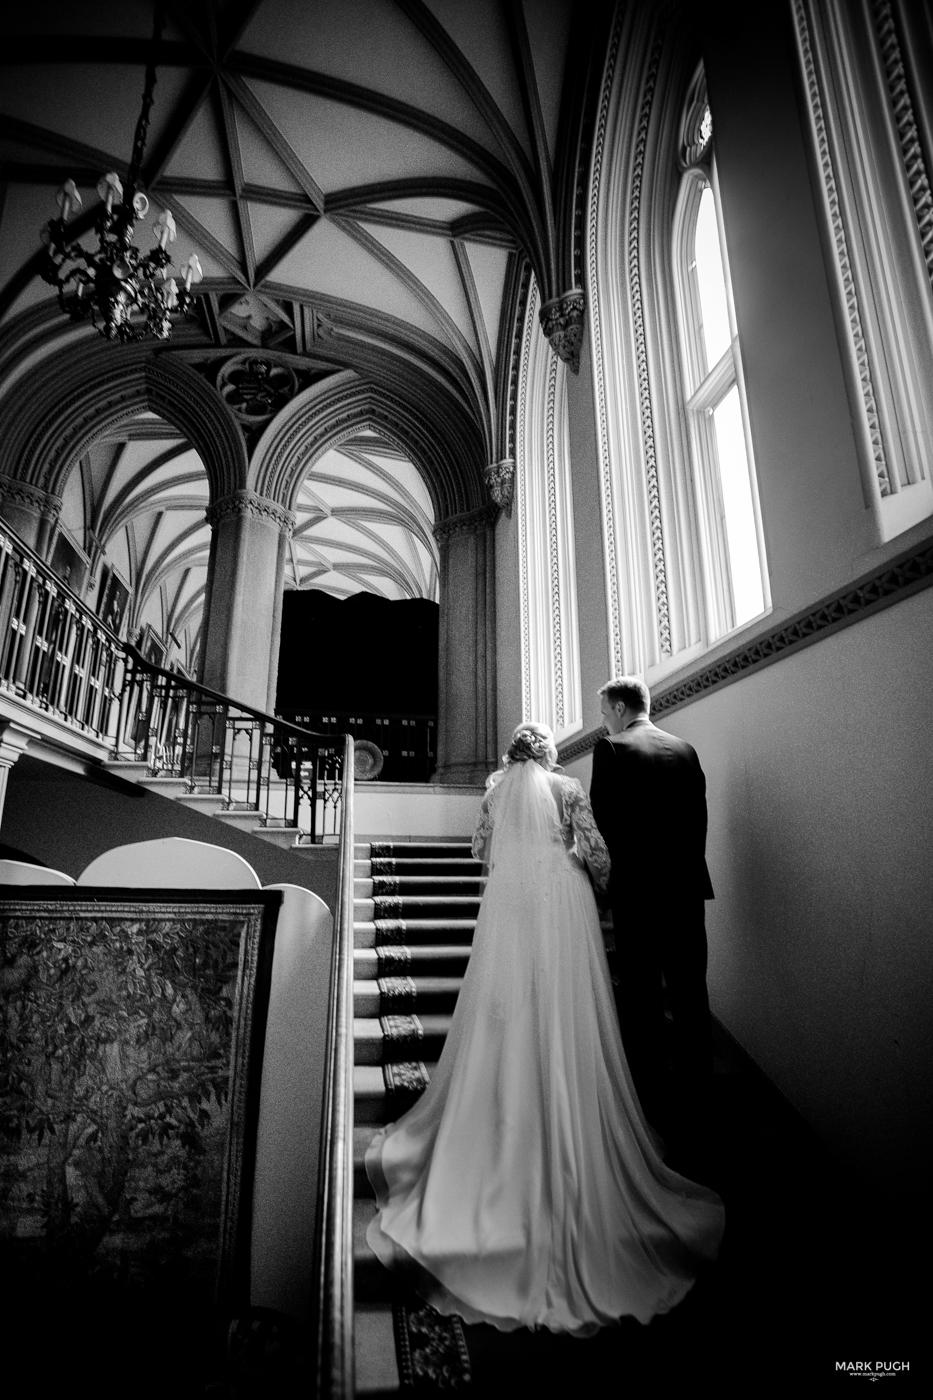 185 Wedding Photography Award winning Wedding Photographer and Videographer Mark Pugh www.markpugh.com.JPG